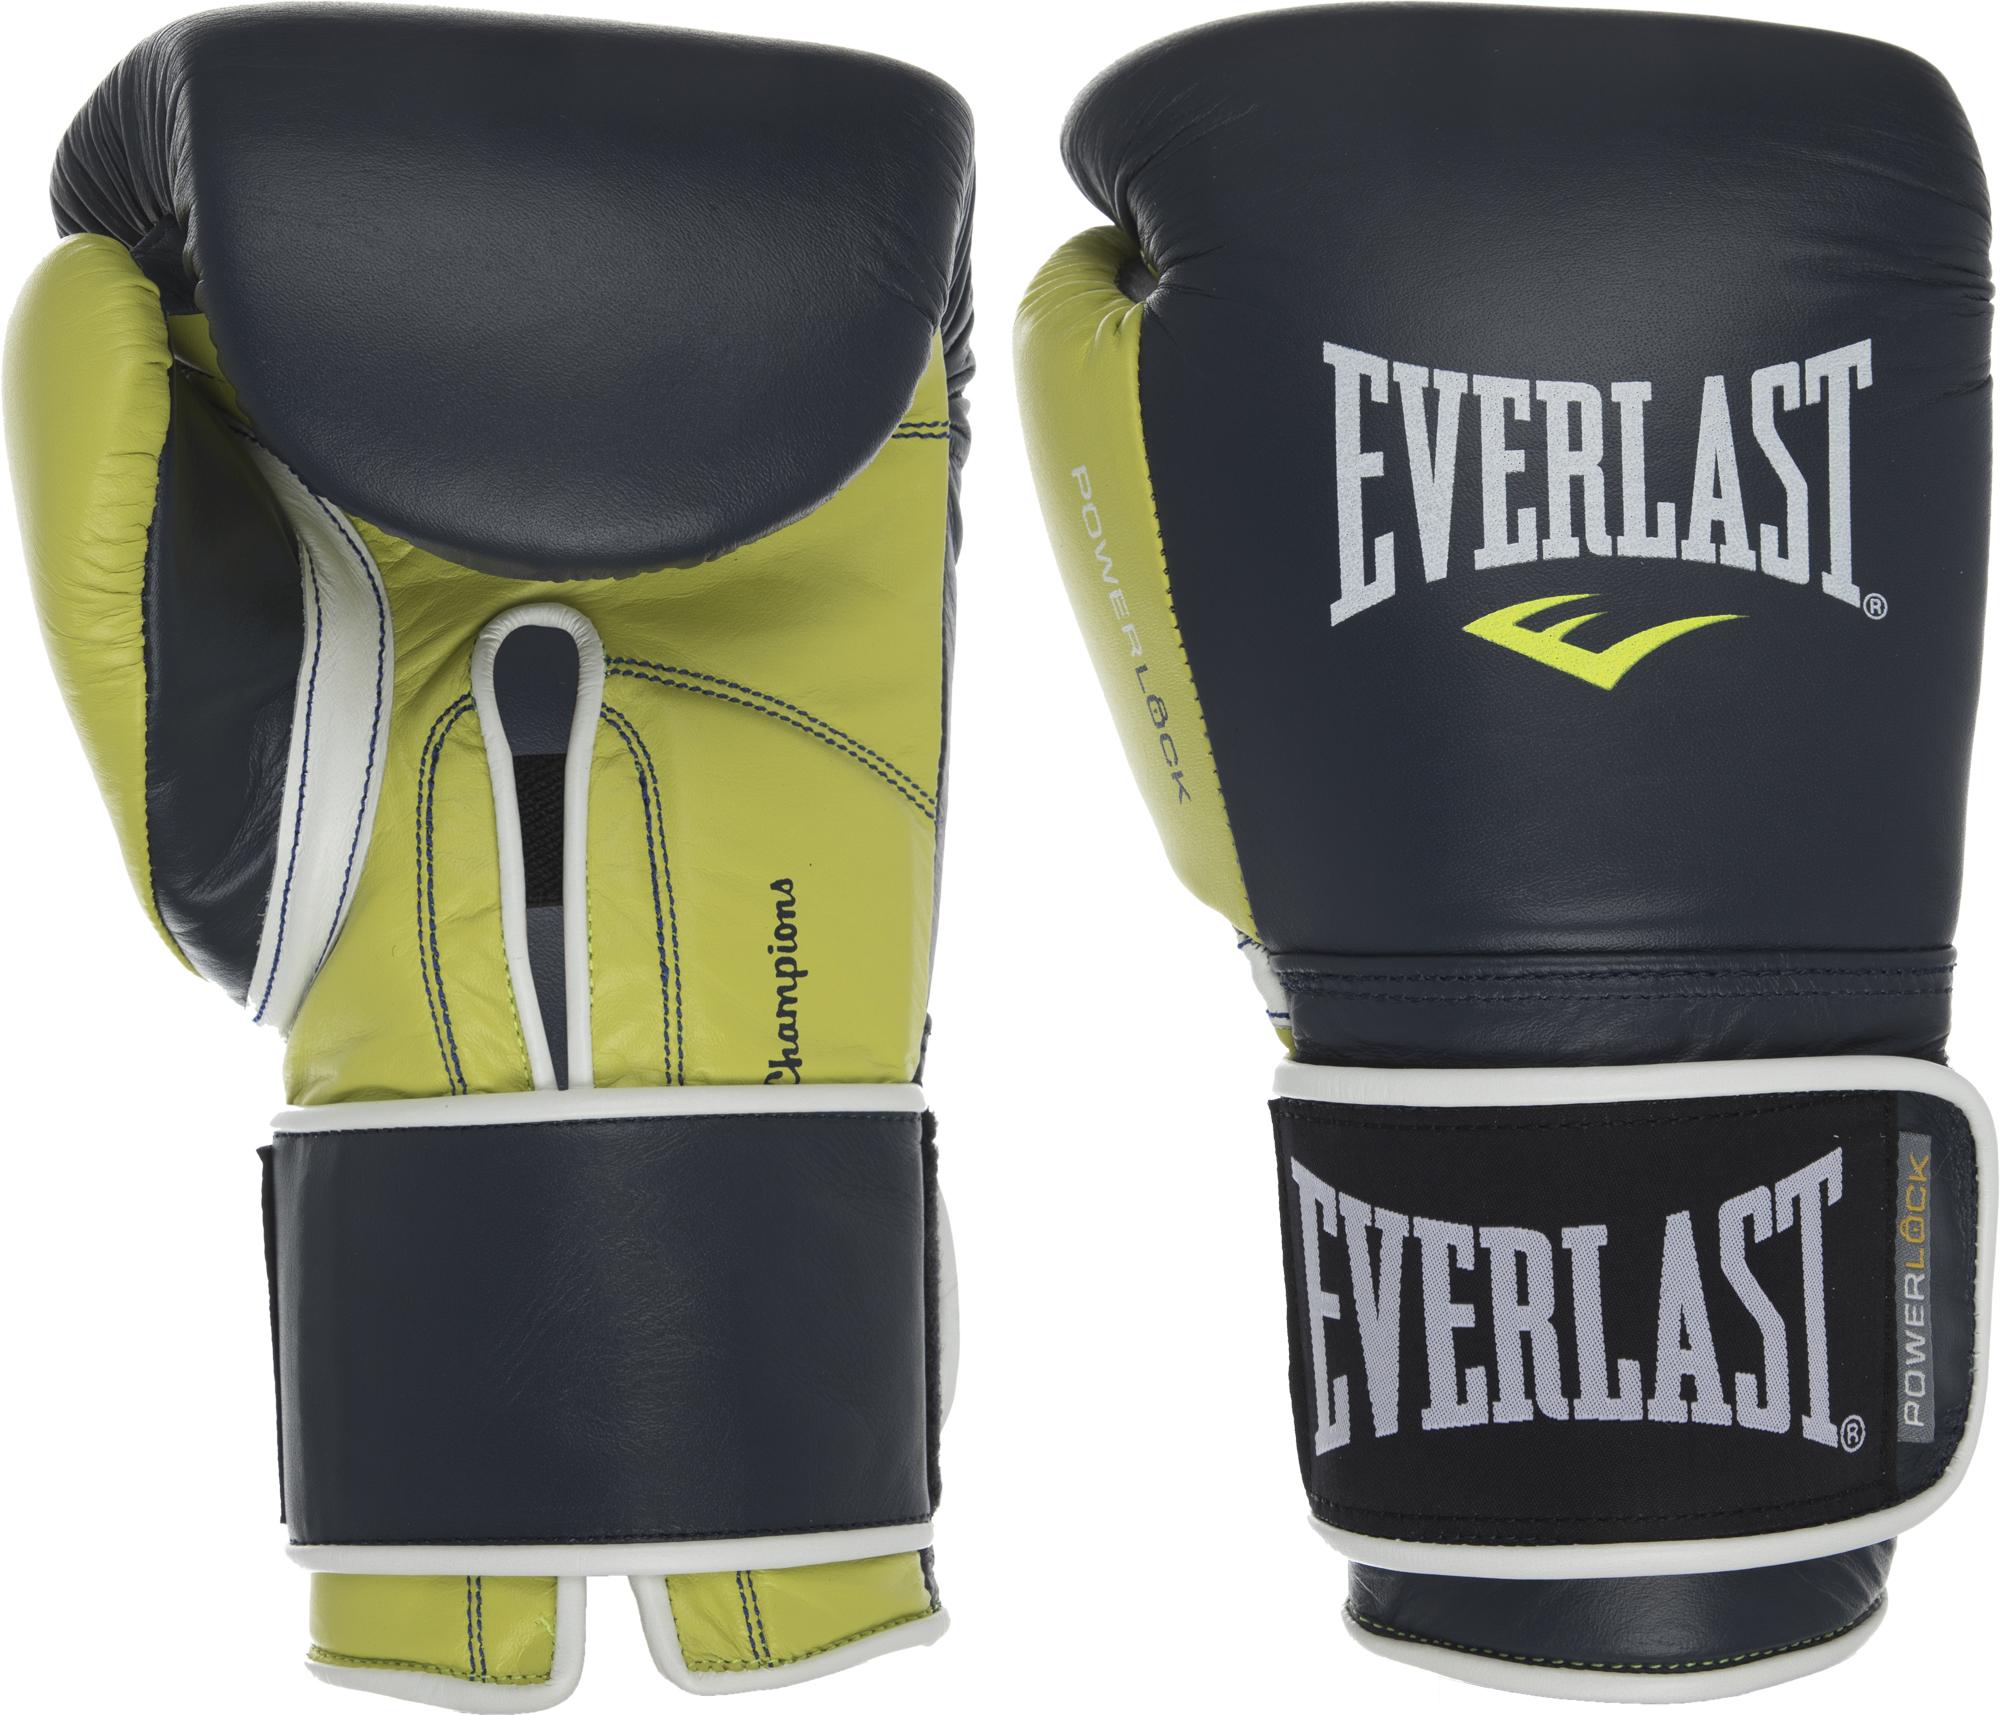 Everlast Перчатки боксерские Everlast POWERLOCK Leather, размер 14 oz